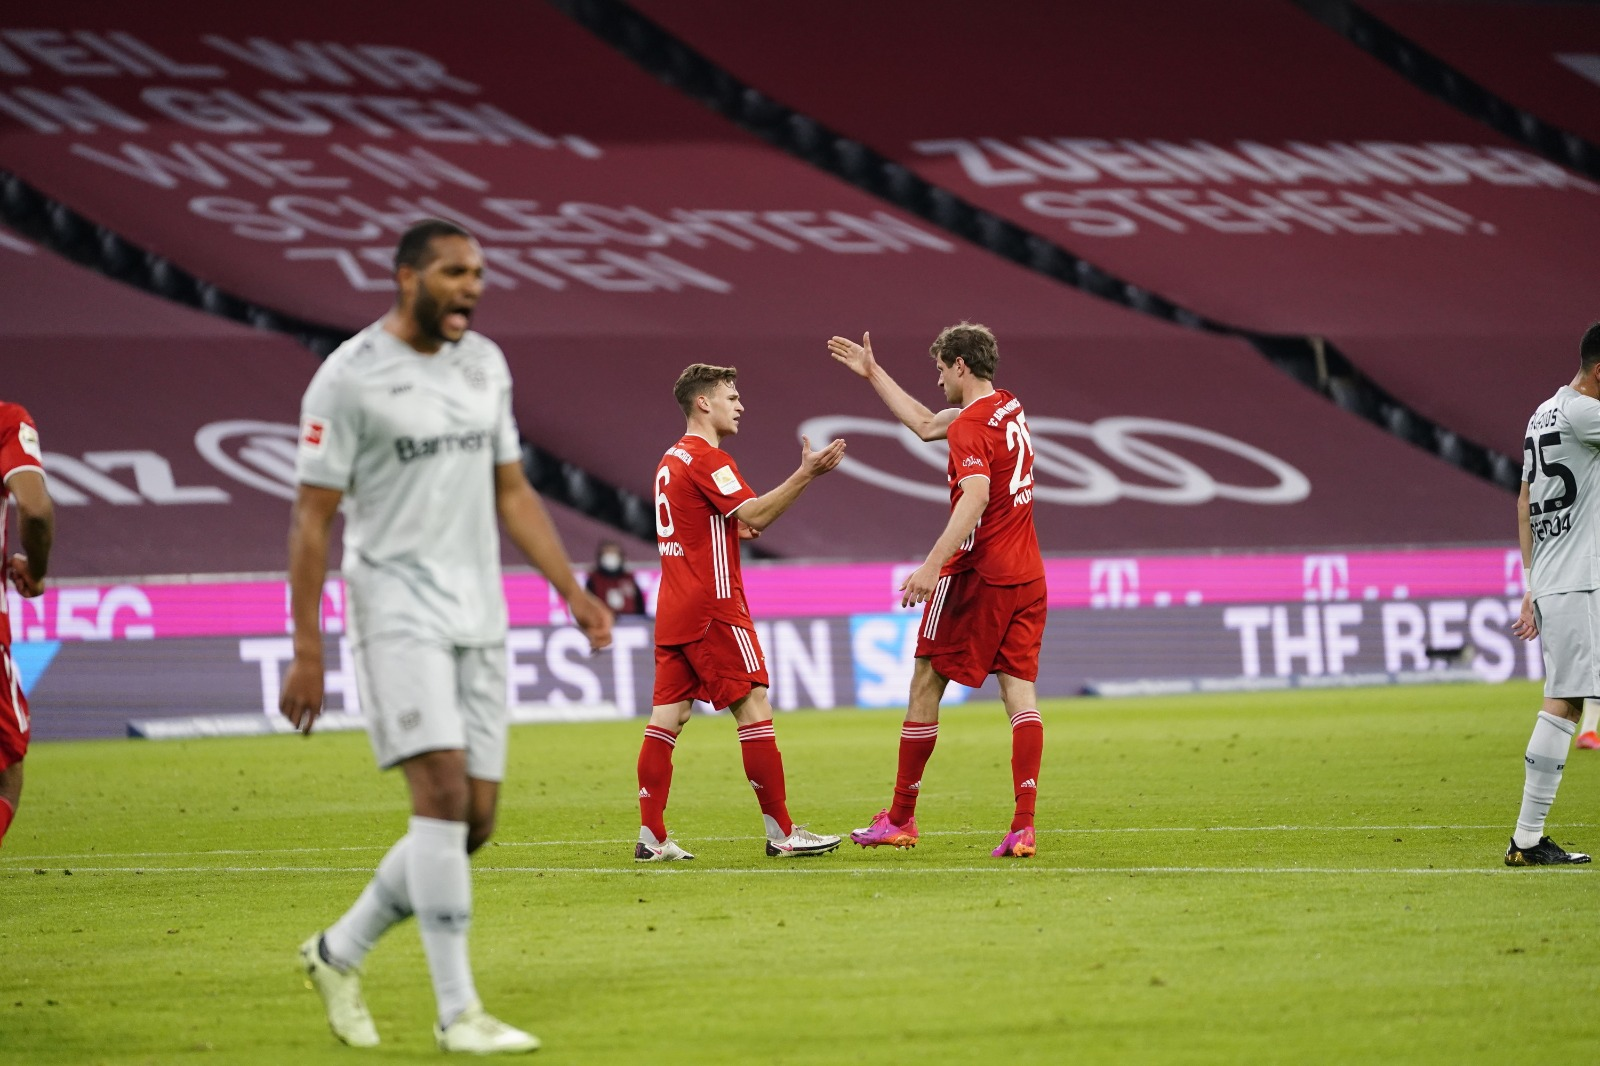 Bayern Munich băng băng về đích ở Bundesliga - Ảnh 7.